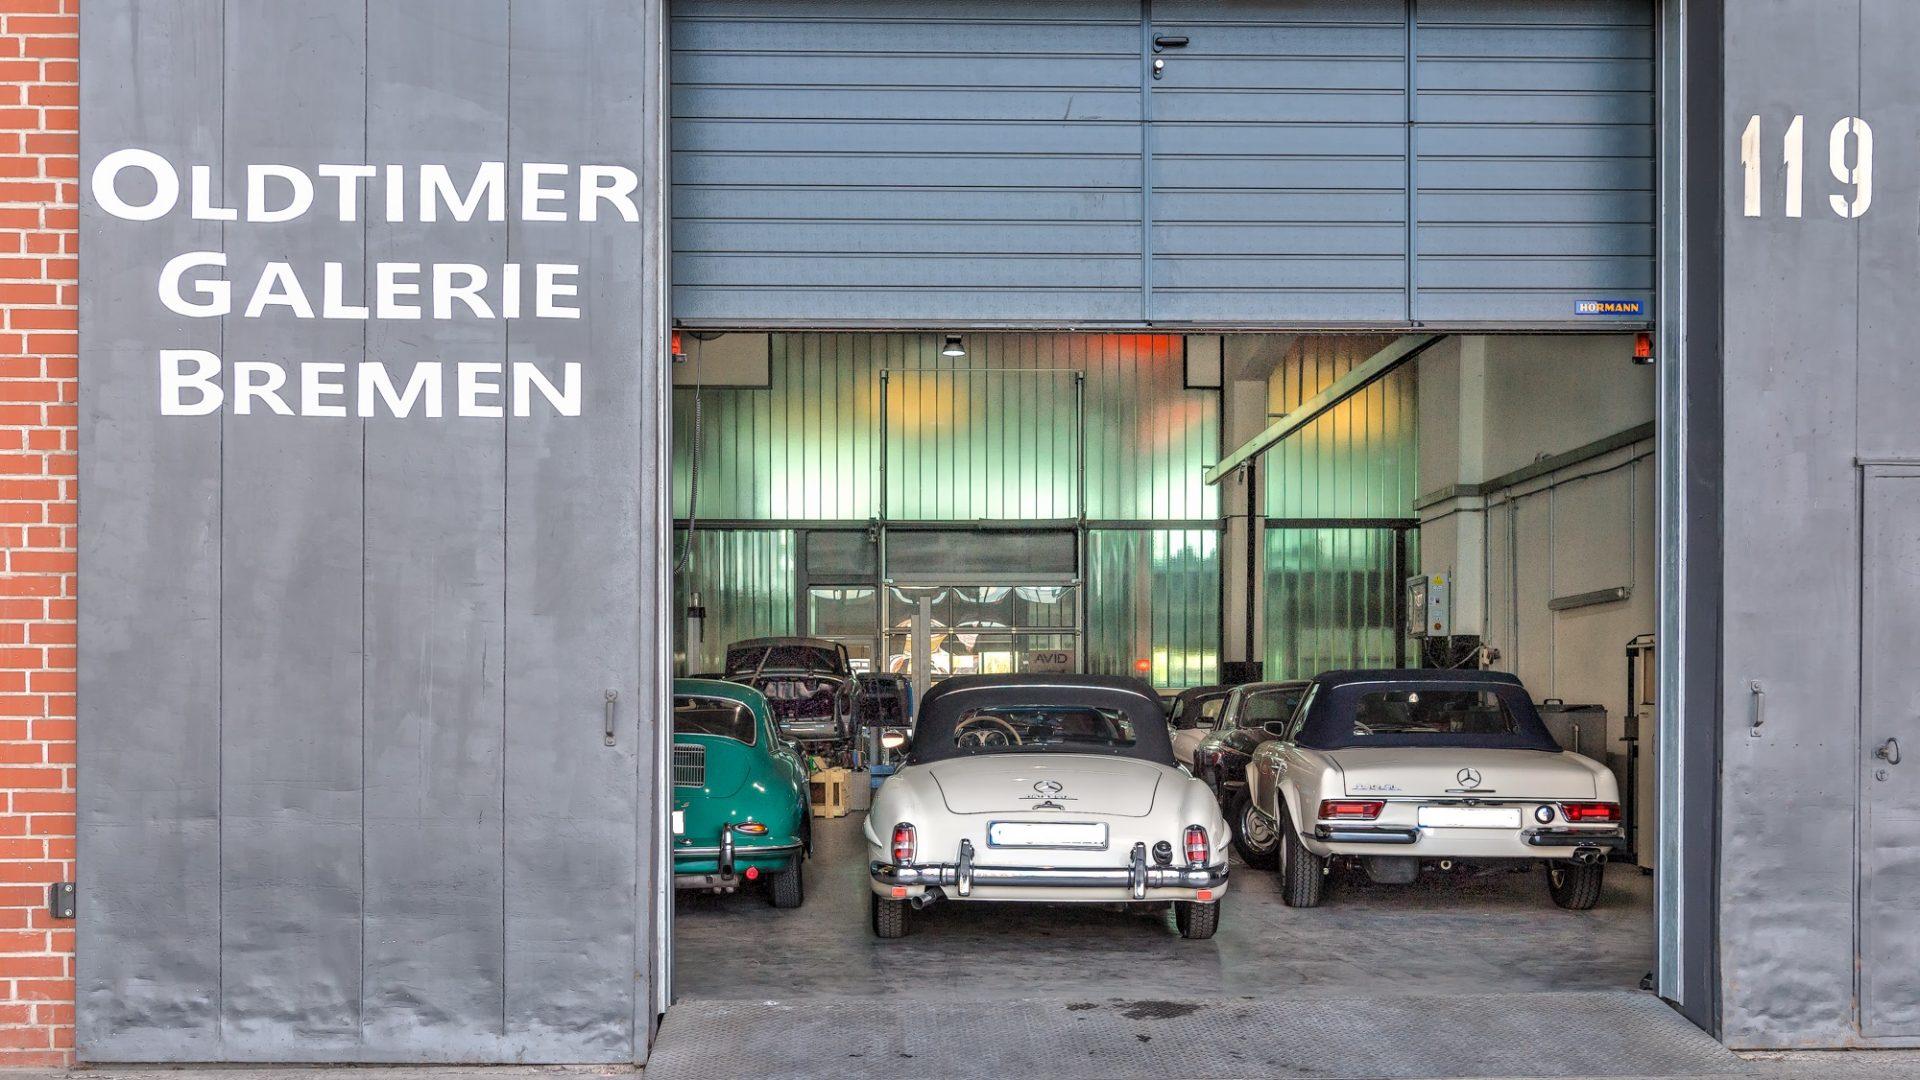 Oldtimer Galerie Bremen